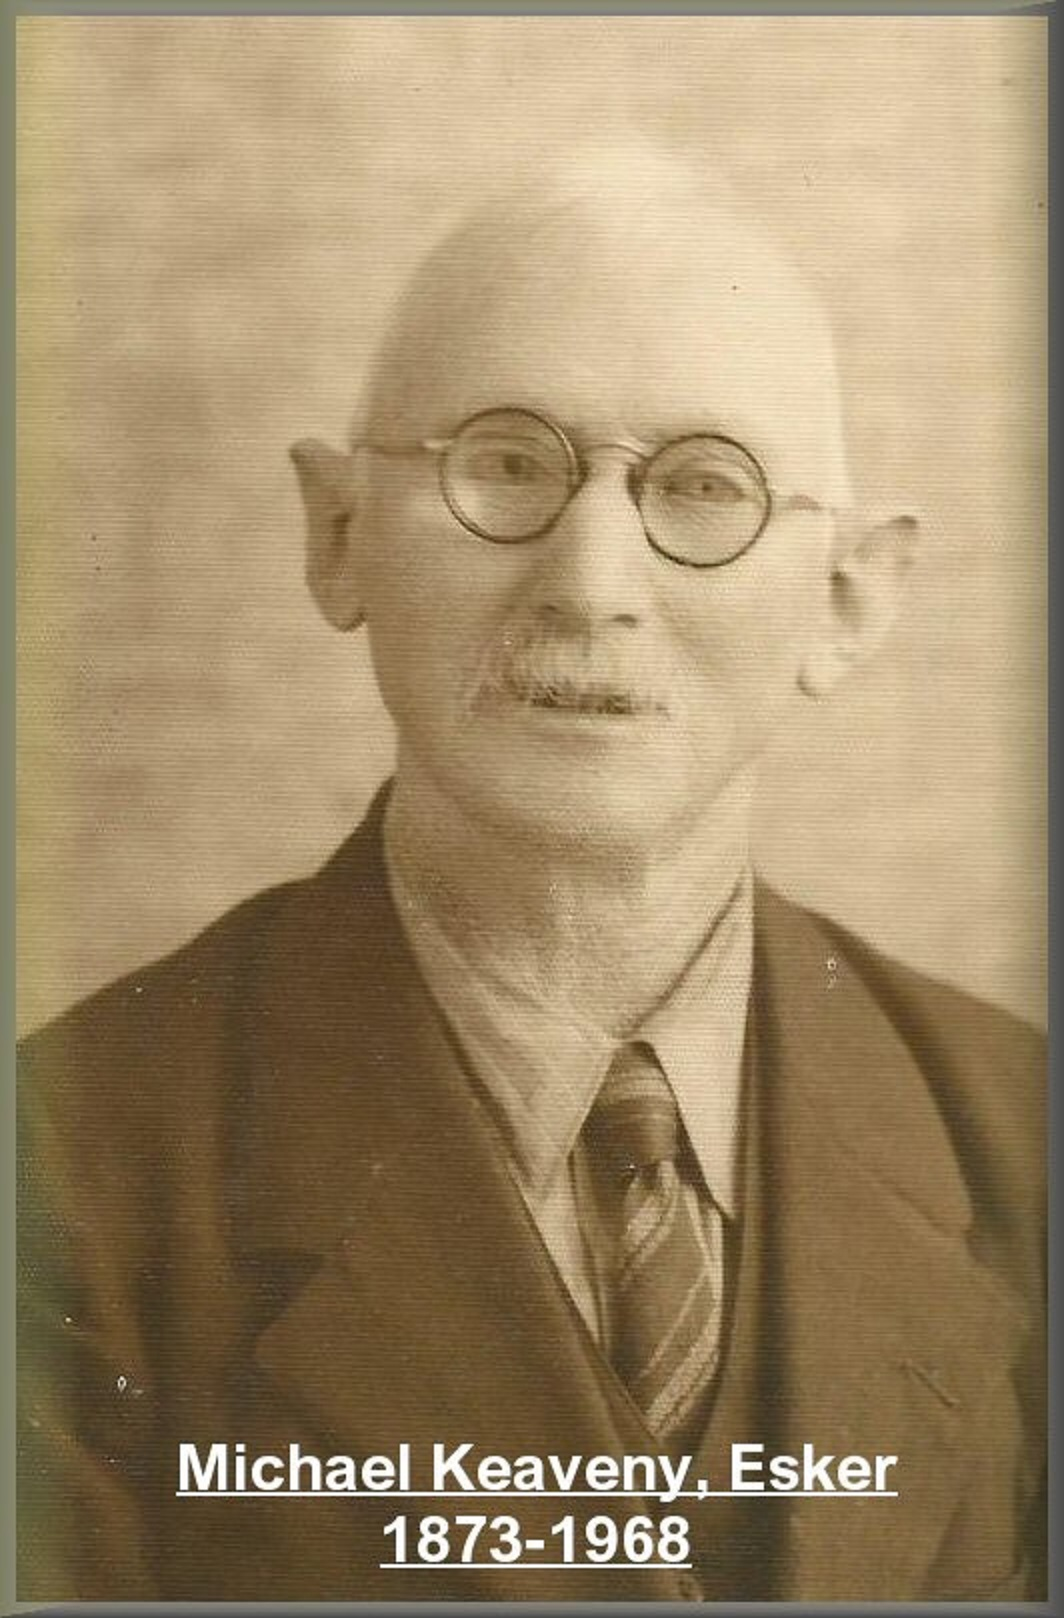 Michael Keaveny, Esker 1873-1968